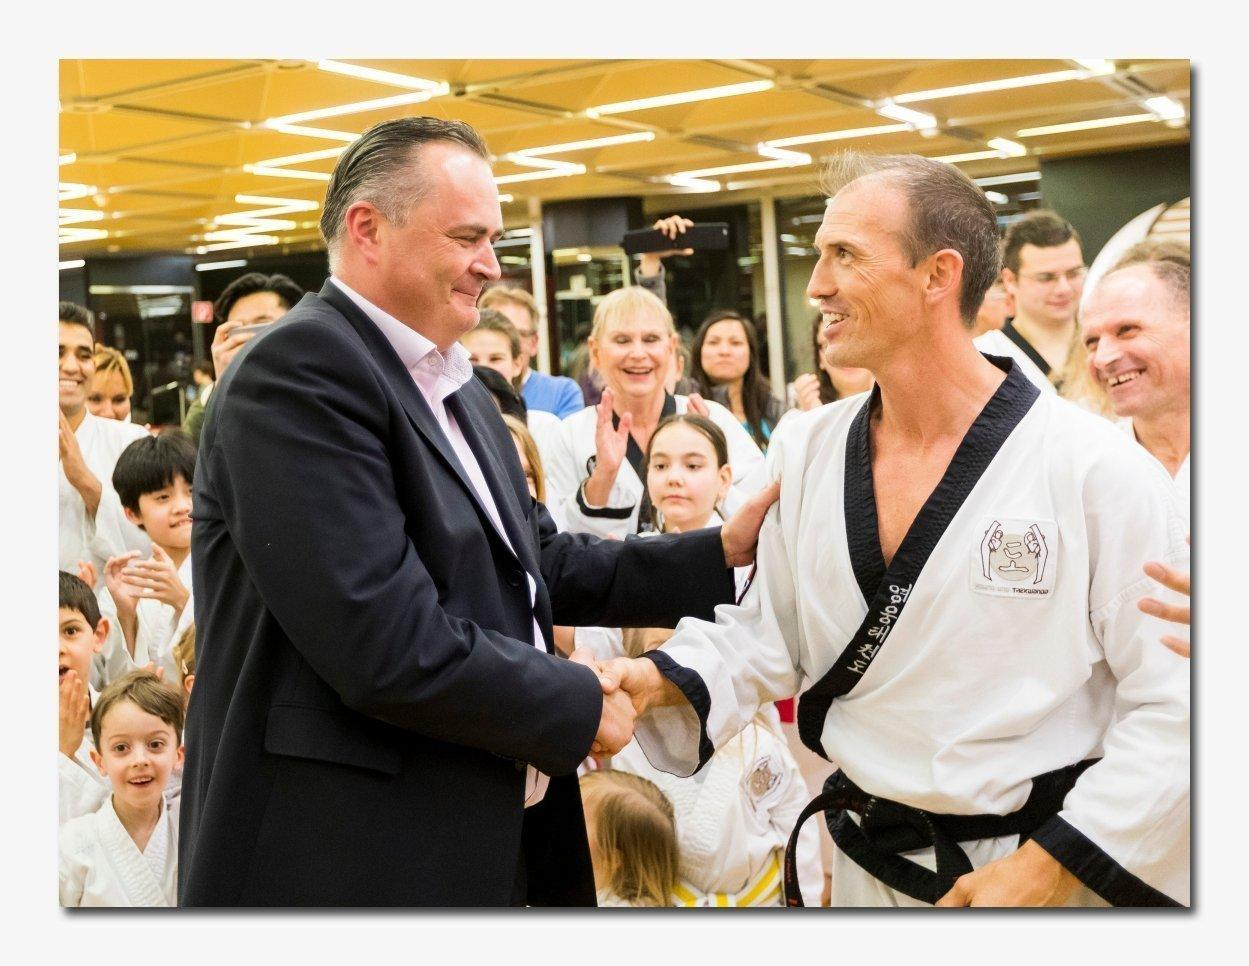 Bundesminister Doskozil besucht Young-Ung Taekwondo